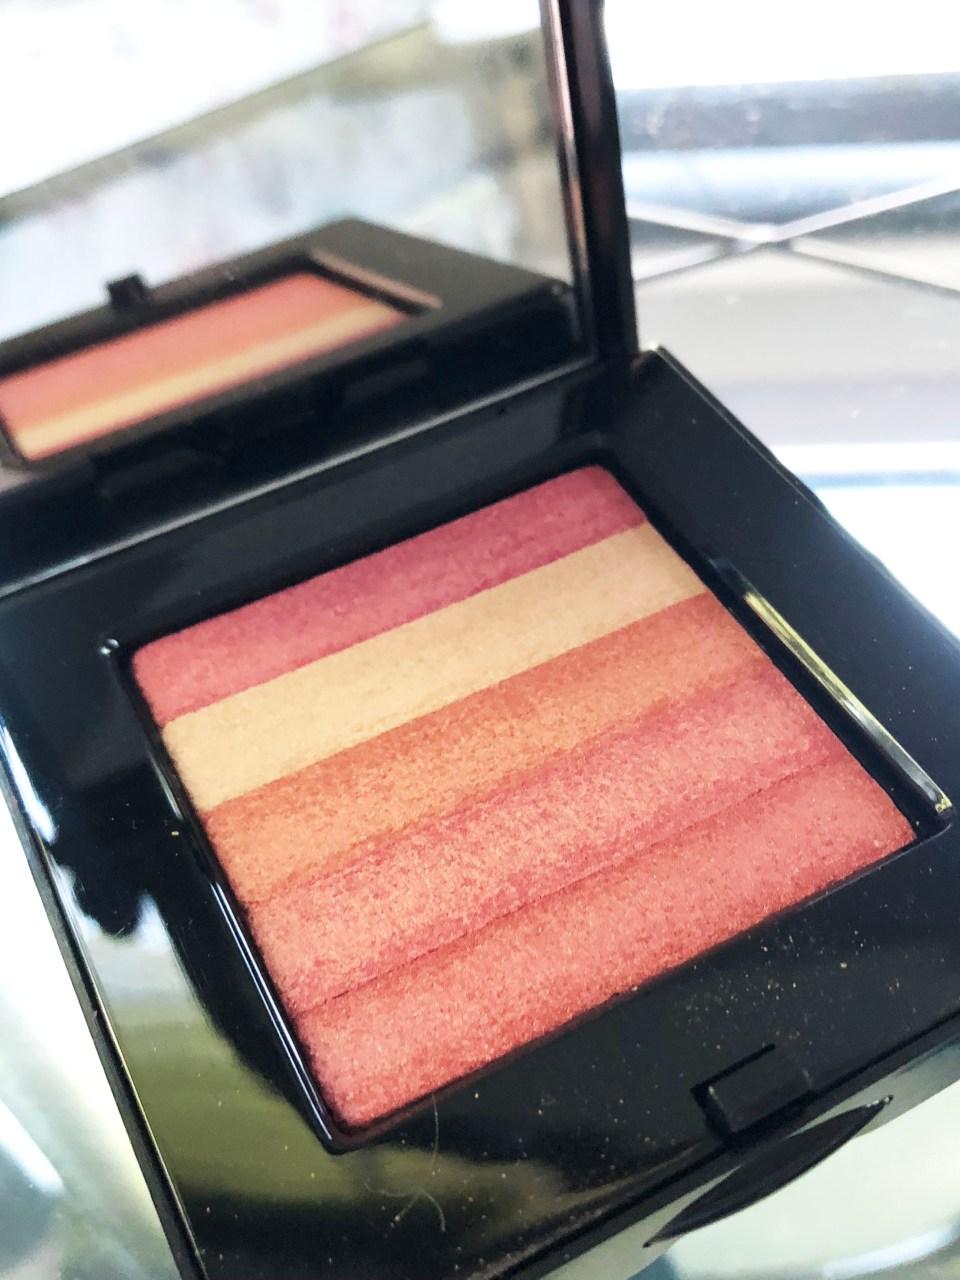 Bobbi Brown Shimmer Brick Nectar 1